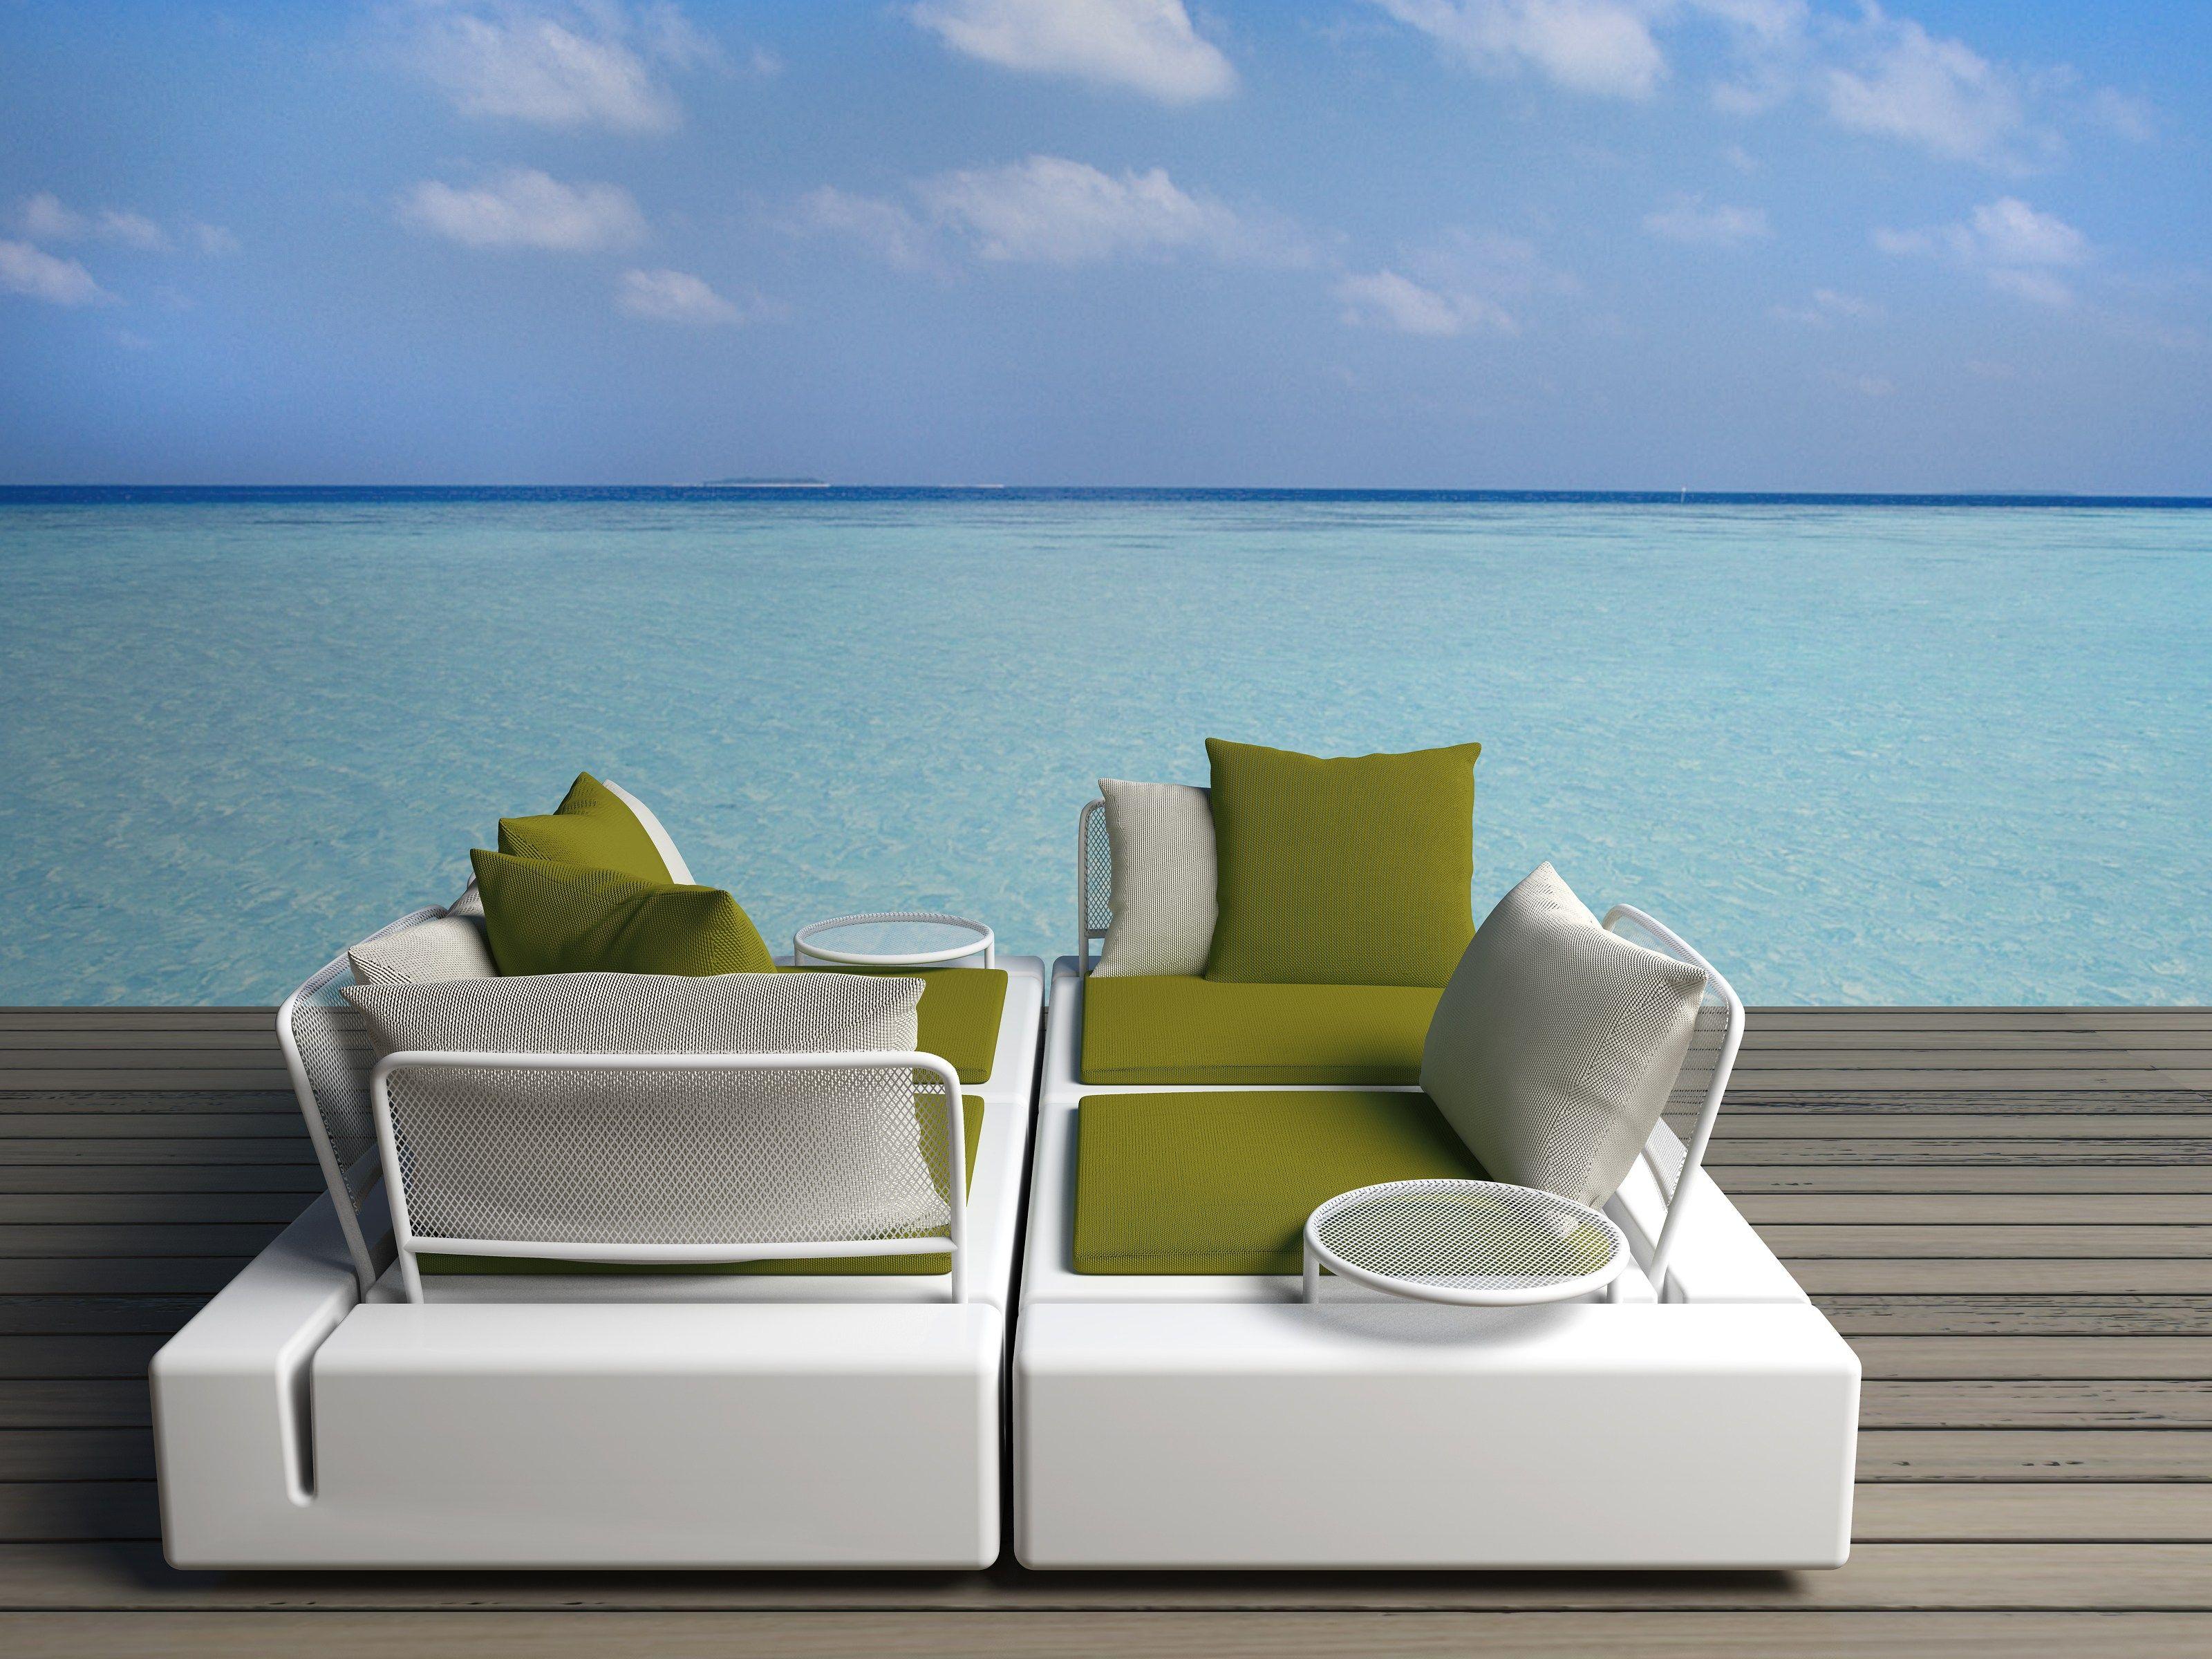 canap composable de jardin kes by vondom design buratti battiston architects. Black Bedroom Furniture Sets. Home Design Ideas